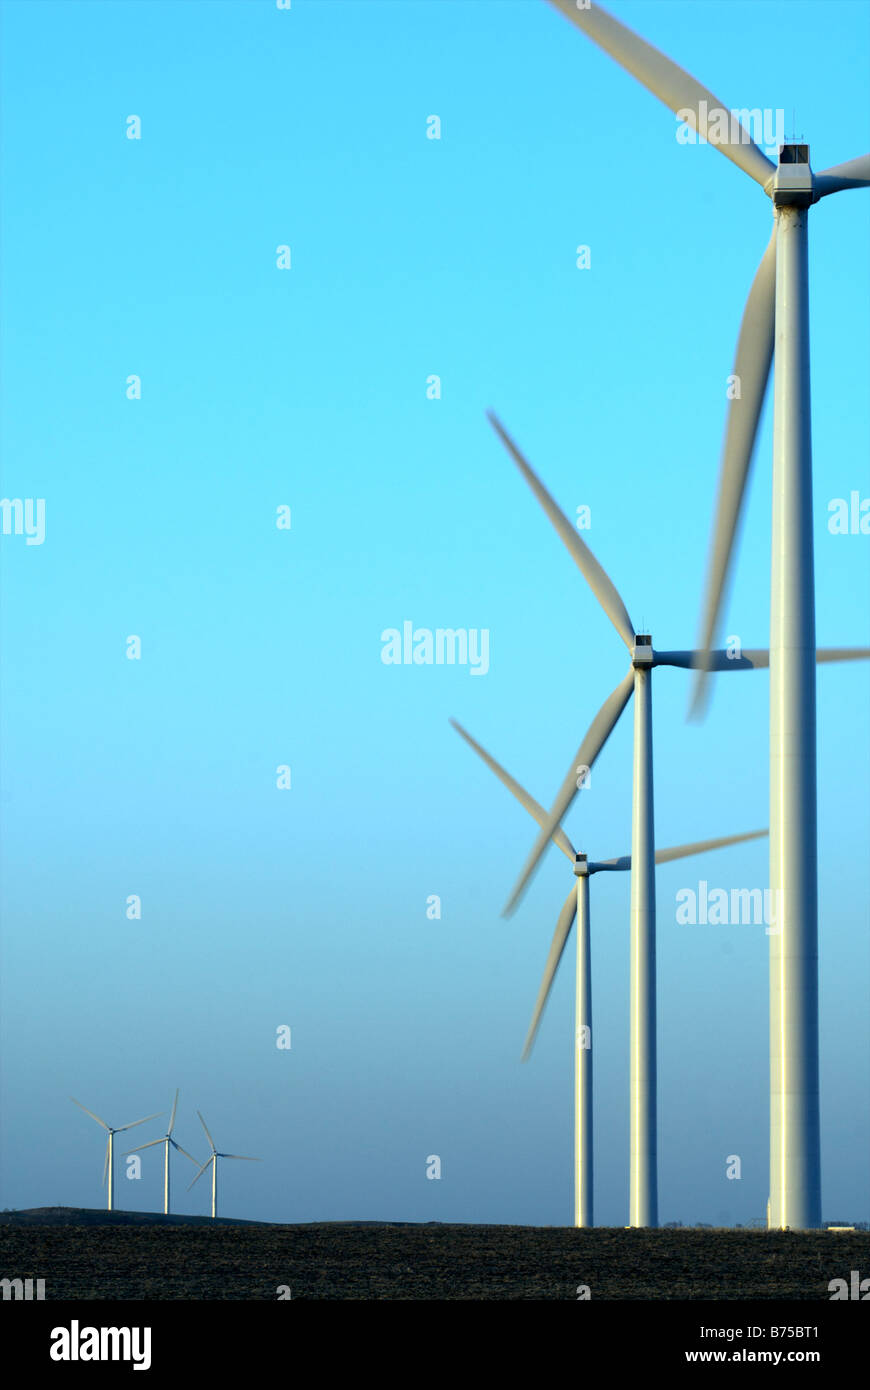 Row of wind turbines - Stock Image